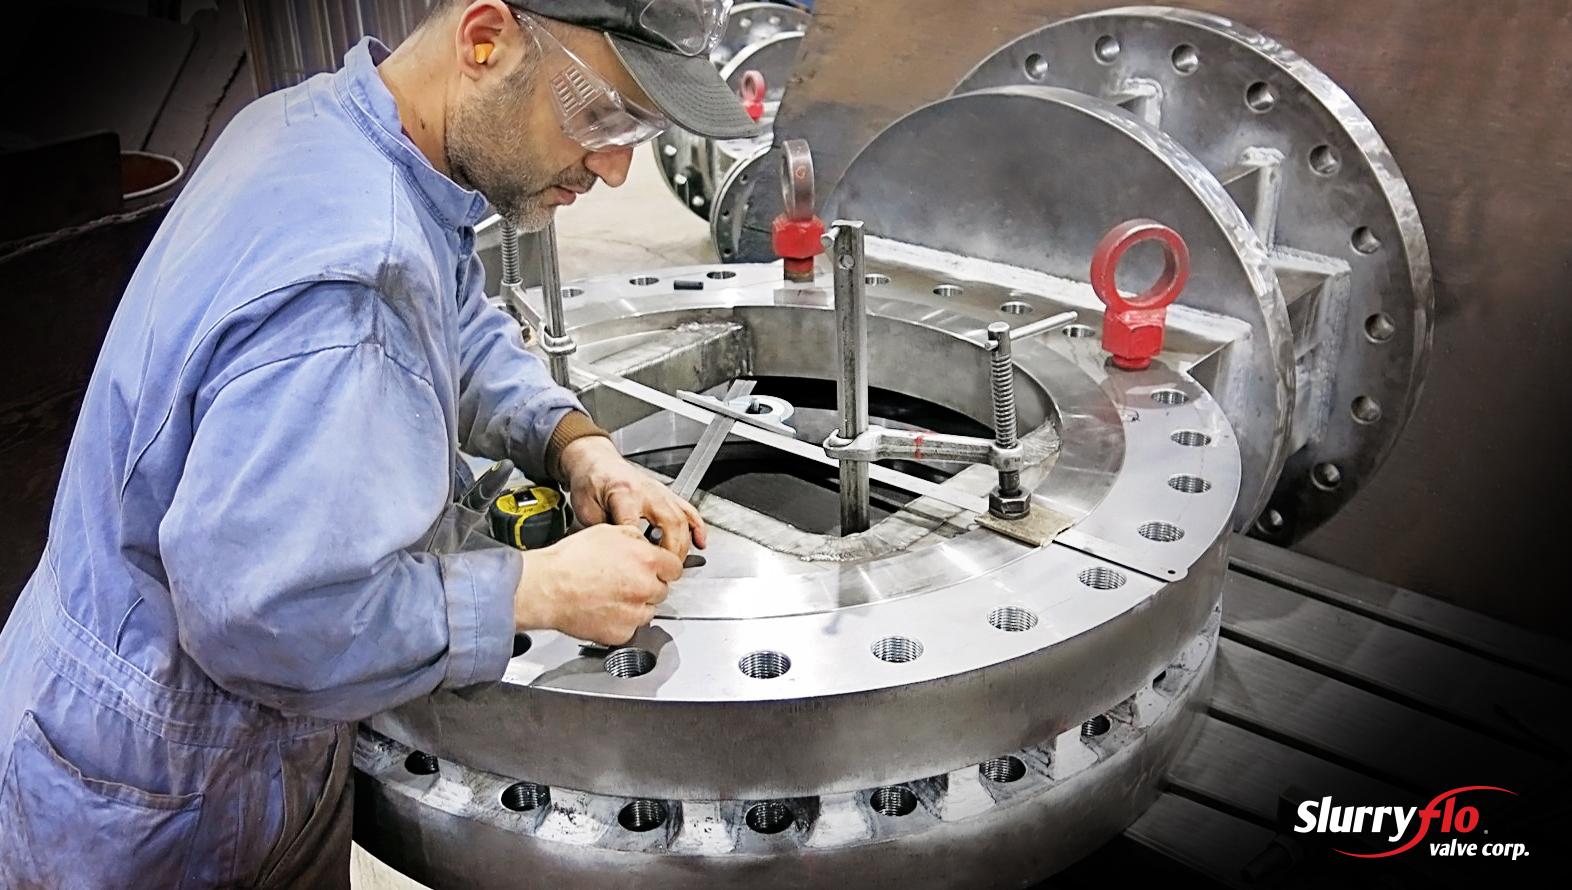 SlurryFlo control valves are manufactured and designed in Canada